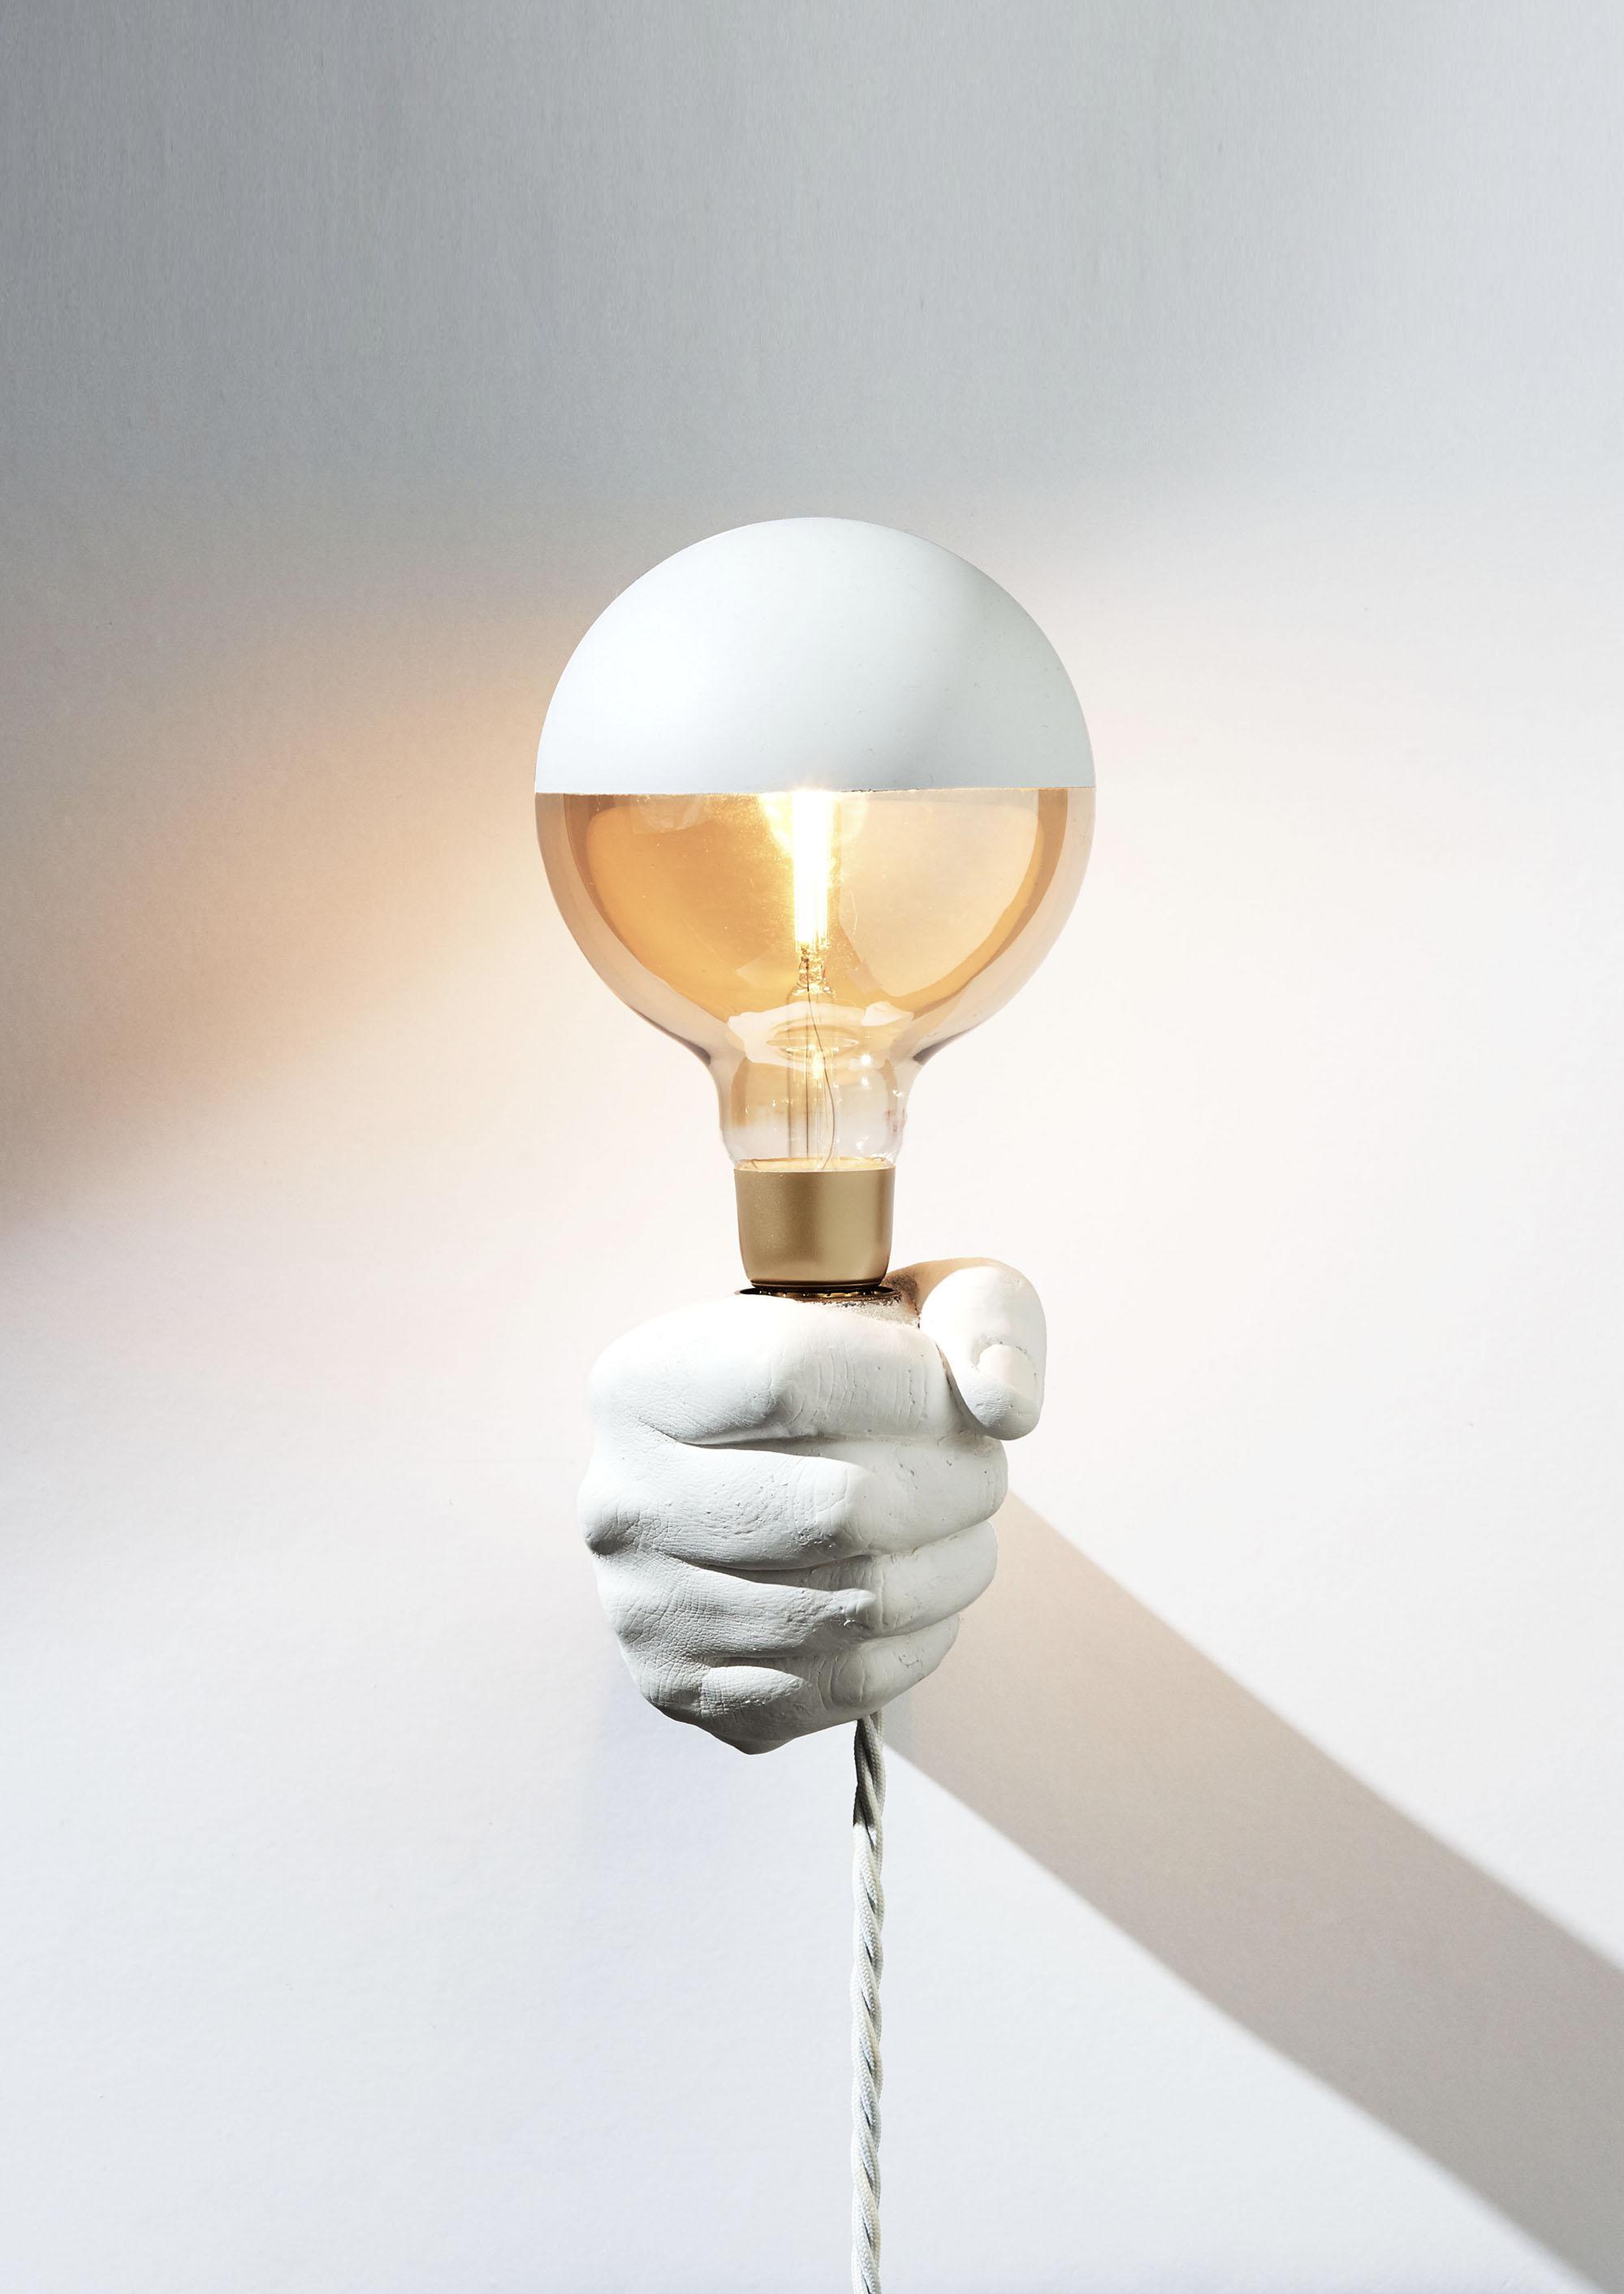 LA BETE - SCONCE LIGHT IN WHITE